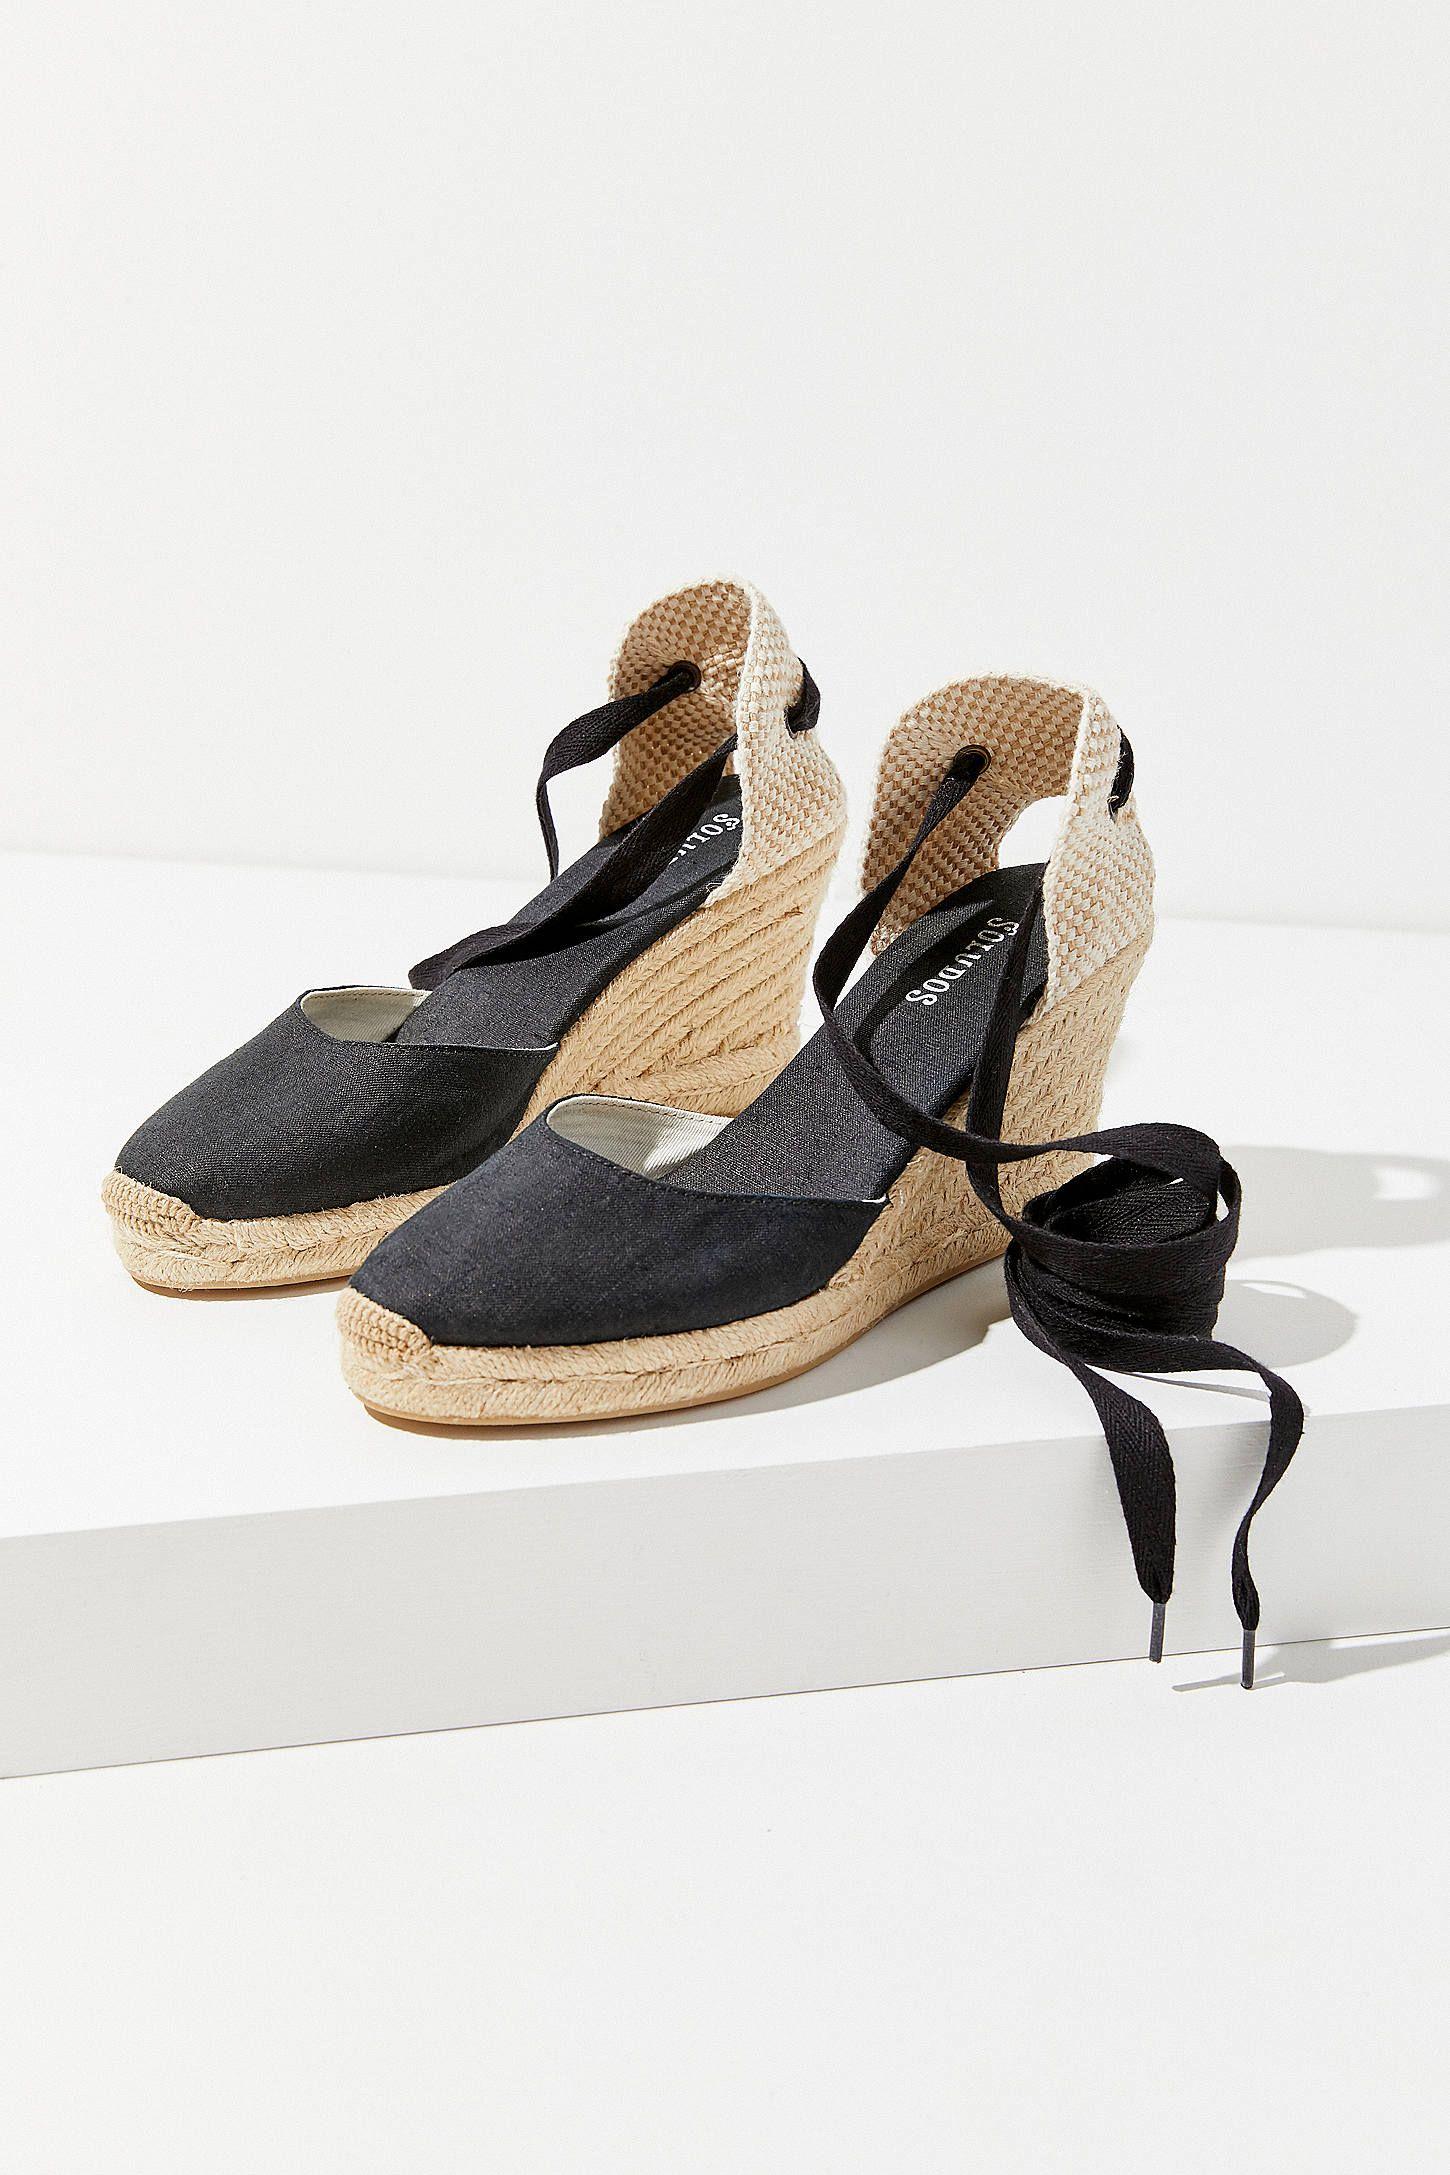 b1d81f9c0a16 Soludos Black Linen Espadrille Tall Wedge Sandal